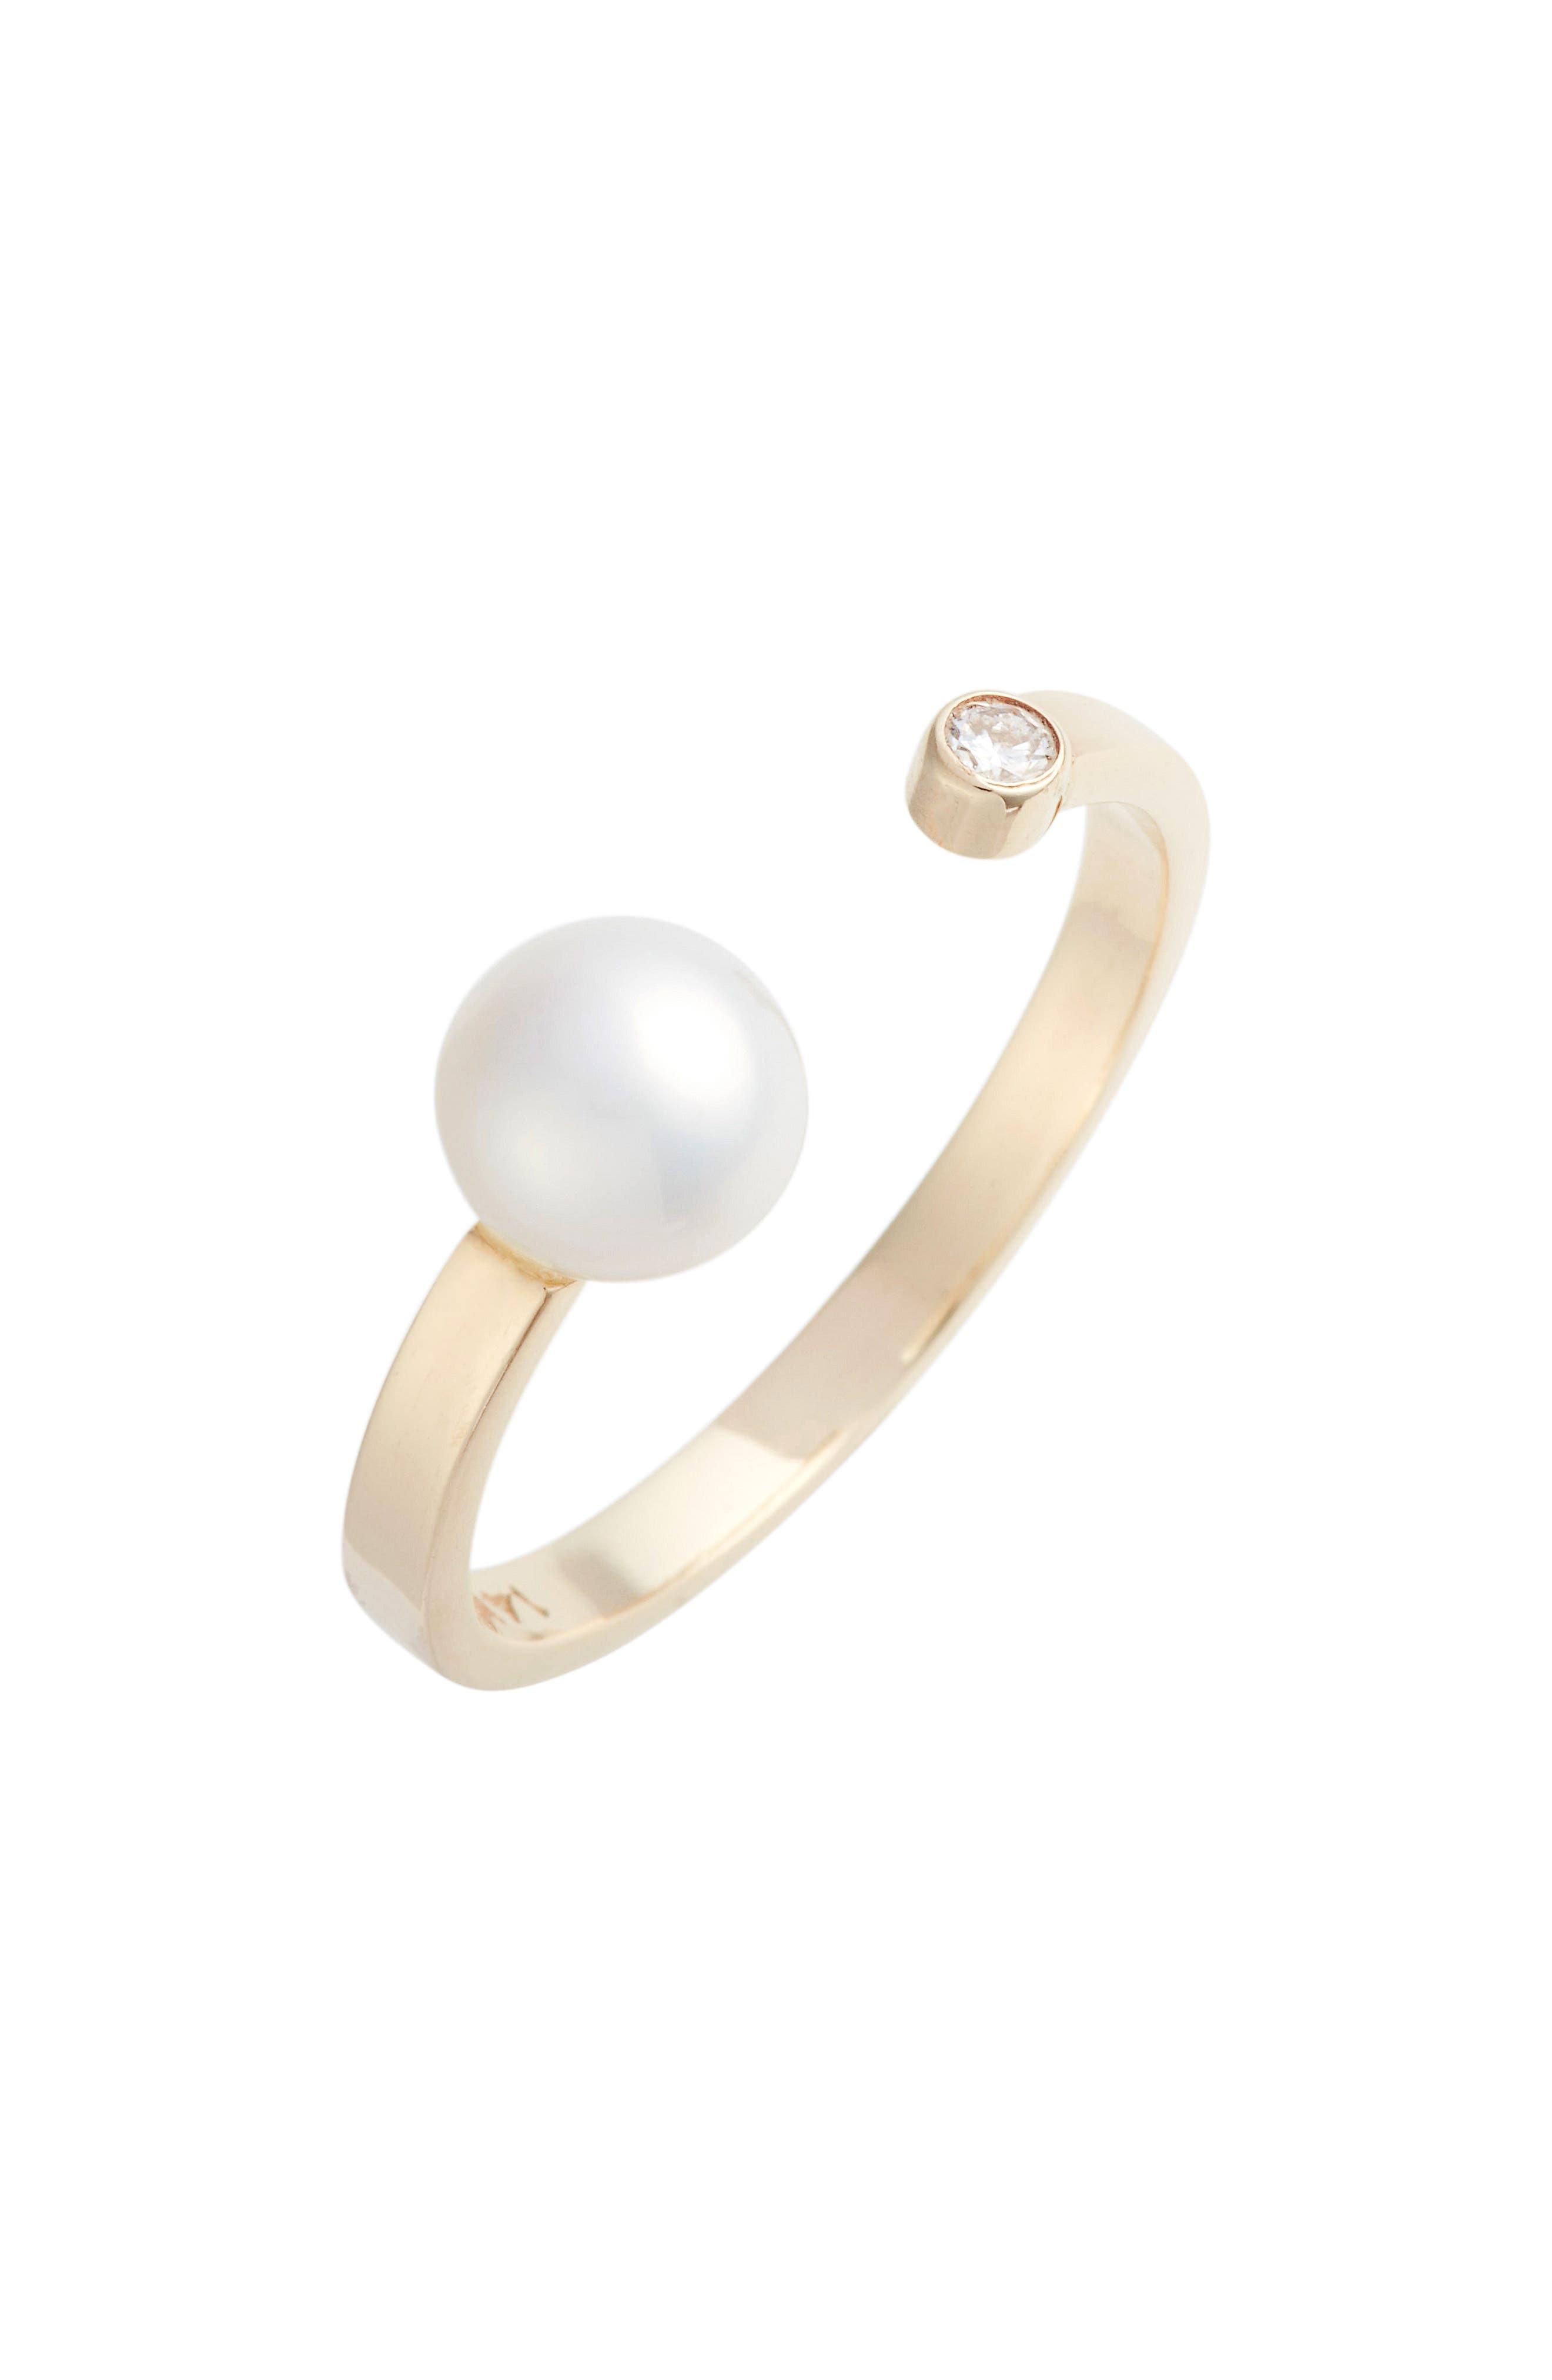 Poppy Finch Diamond & Pearl Bypass Ring